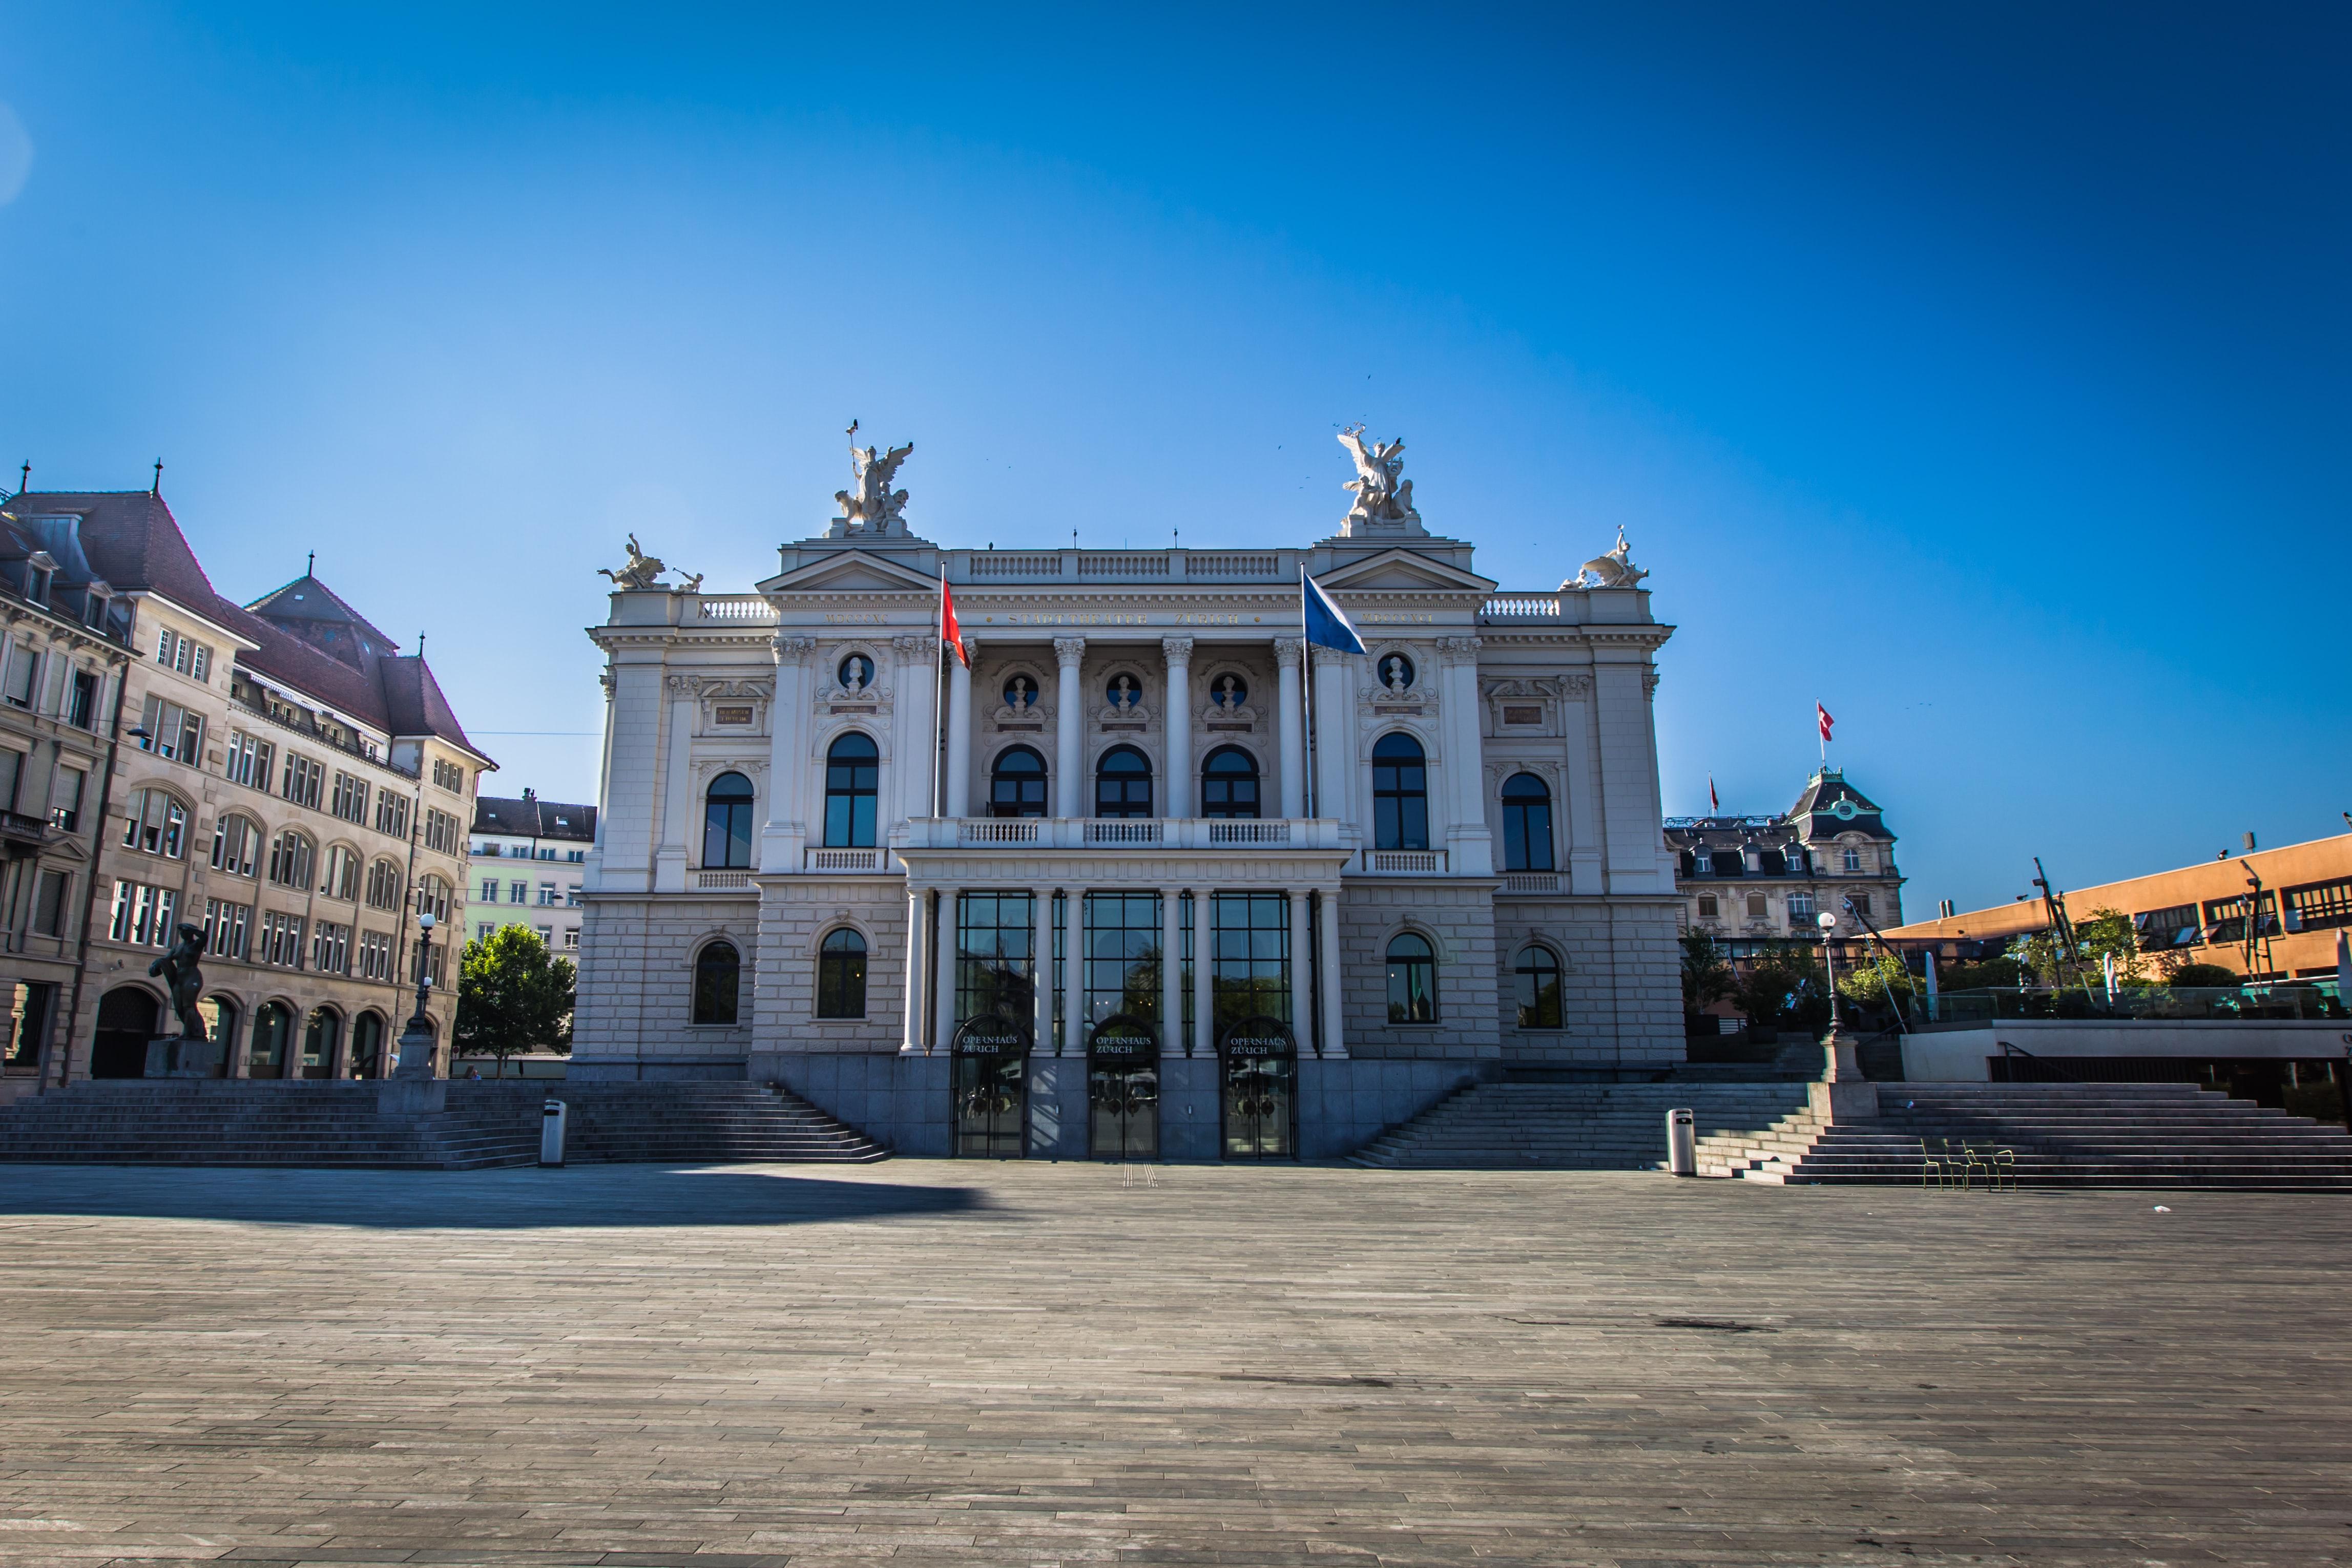 Opera House in the Swiss city of Zürich - located on Sechseläutenplatz